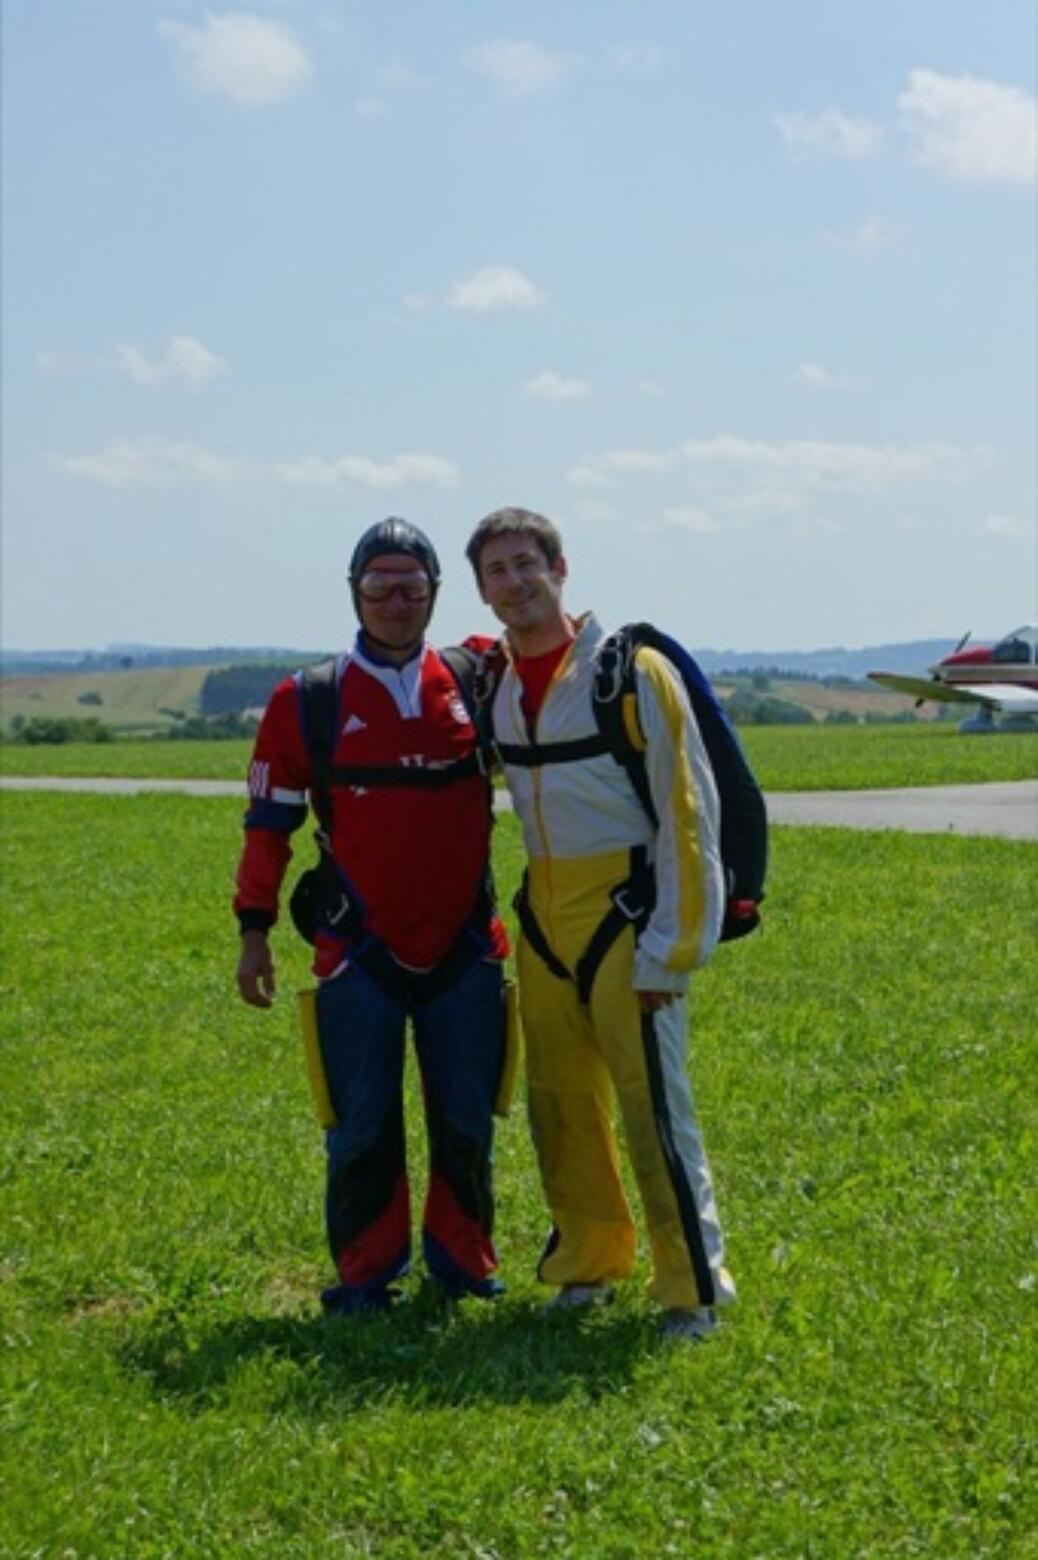 Bayern-Fan Hermann geht in die Luft